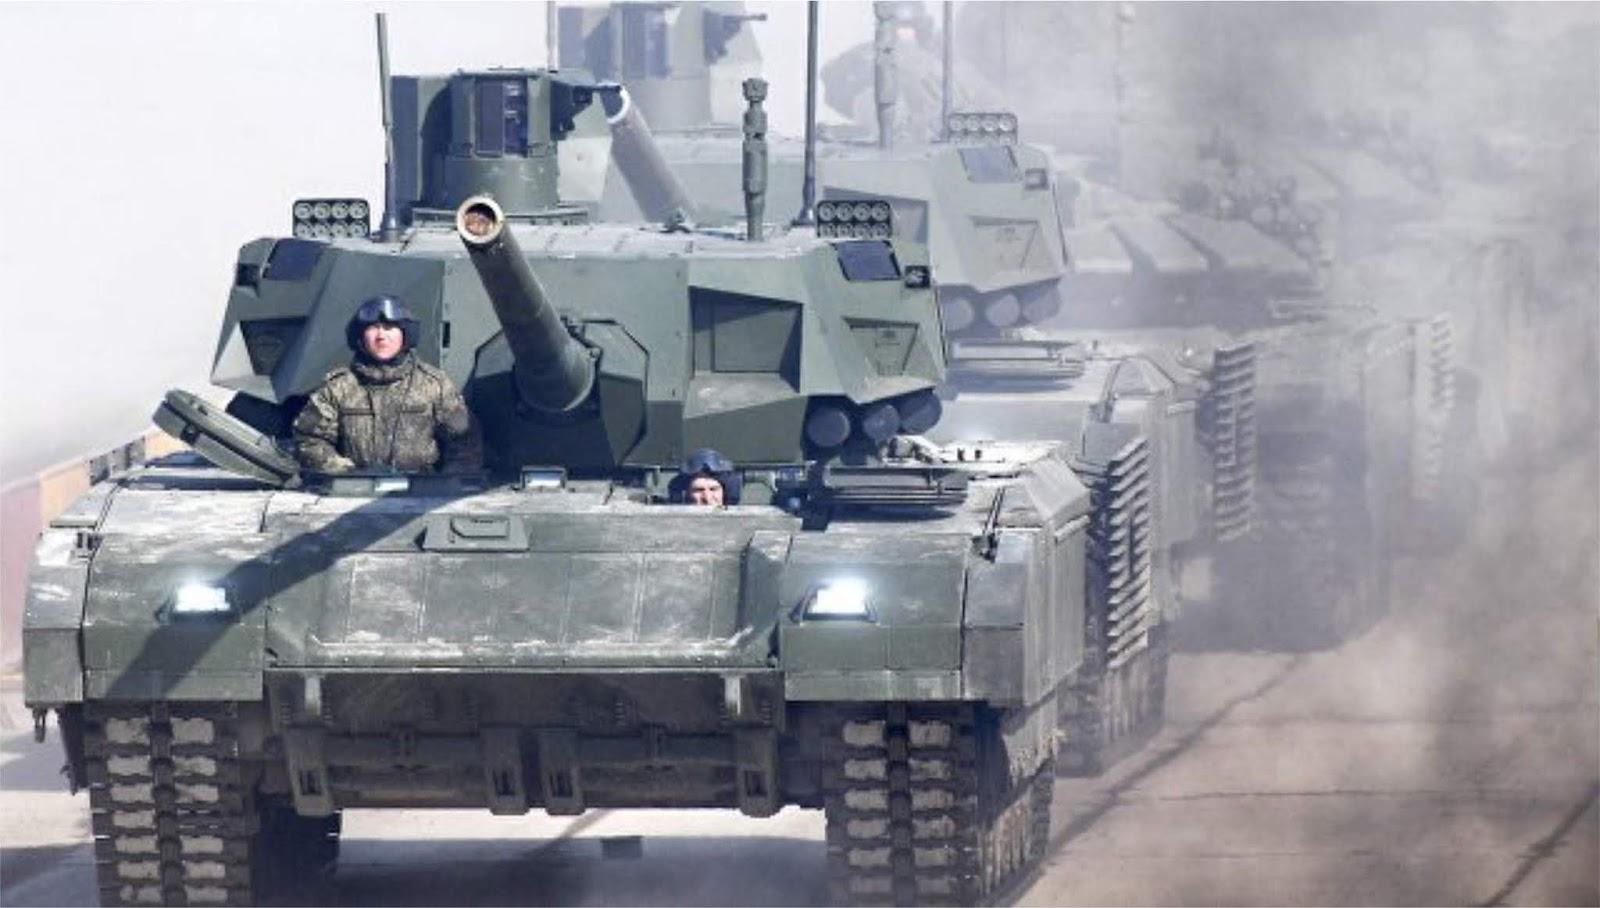 Rusia akan segera menyelesaikan amunisi kaliber 57 mm yang terkendali